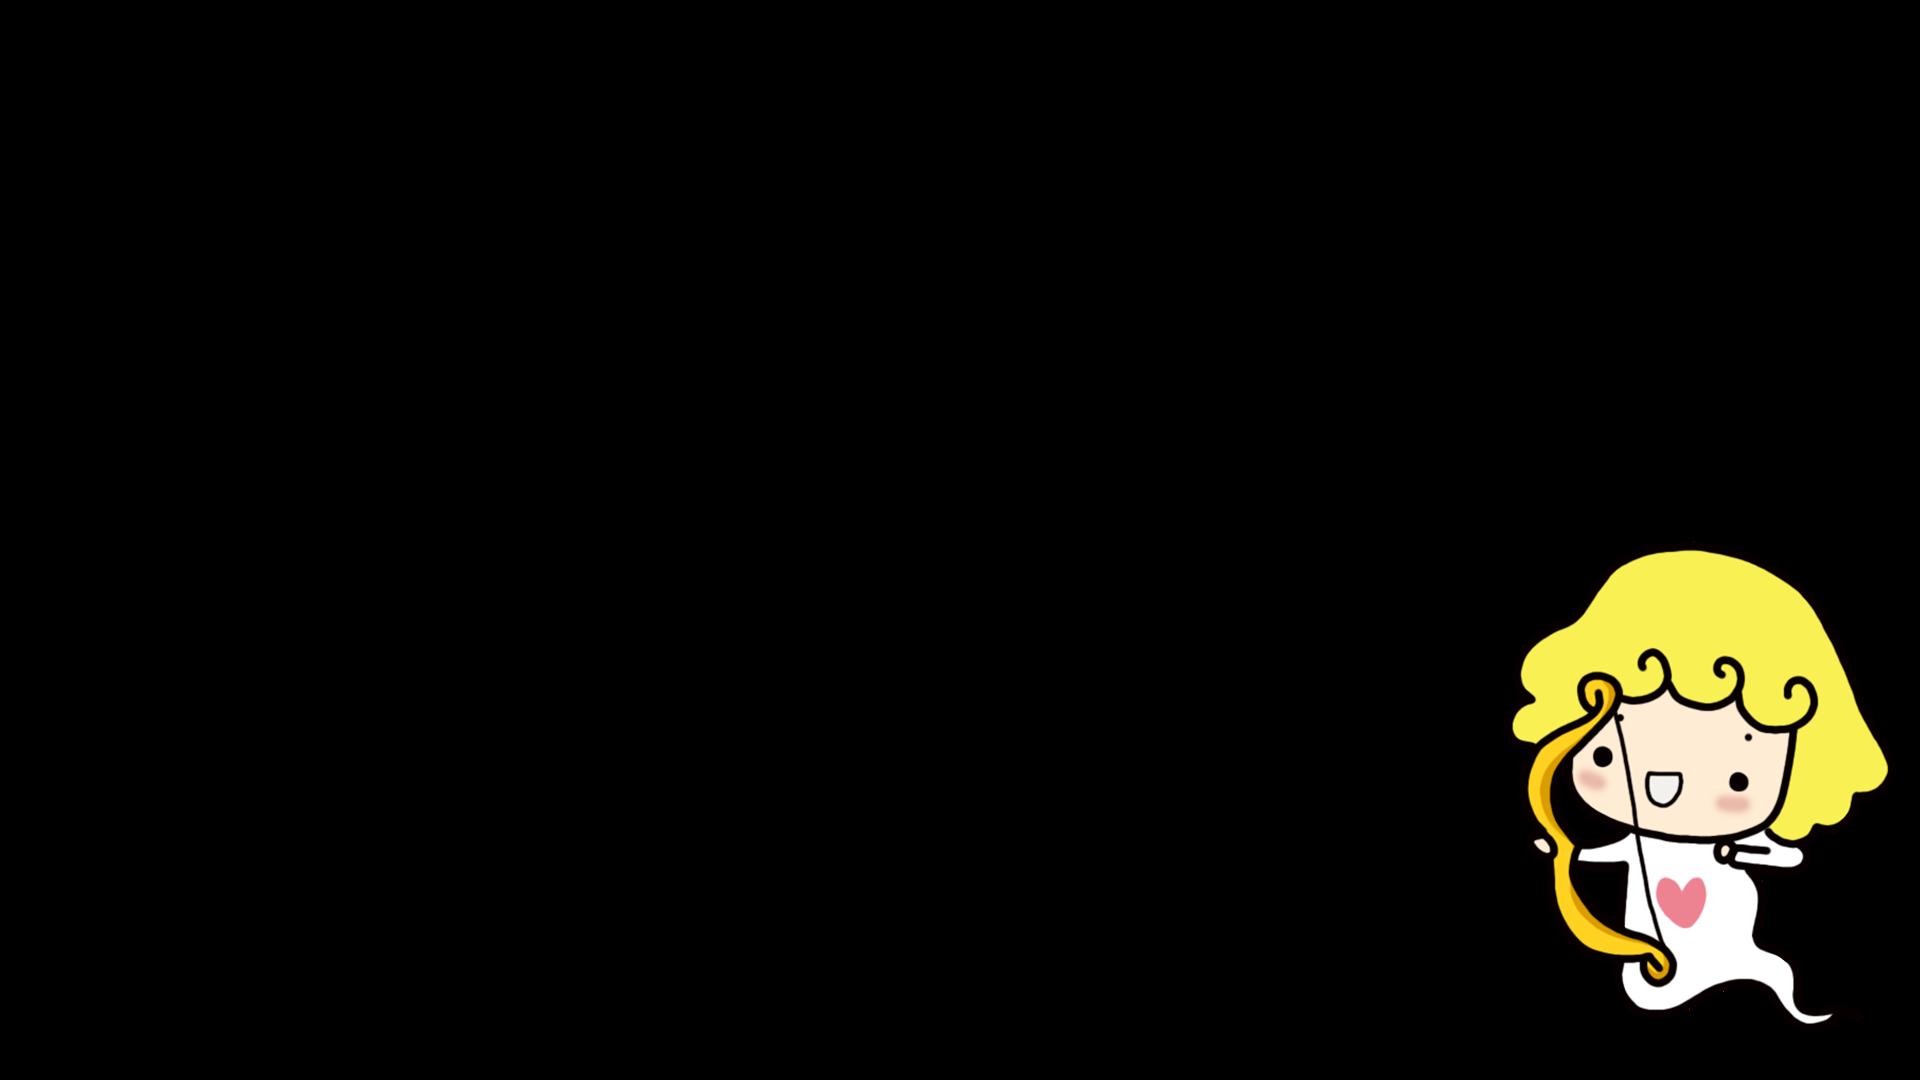 png透明水印素材152个,分辨率1920x1080